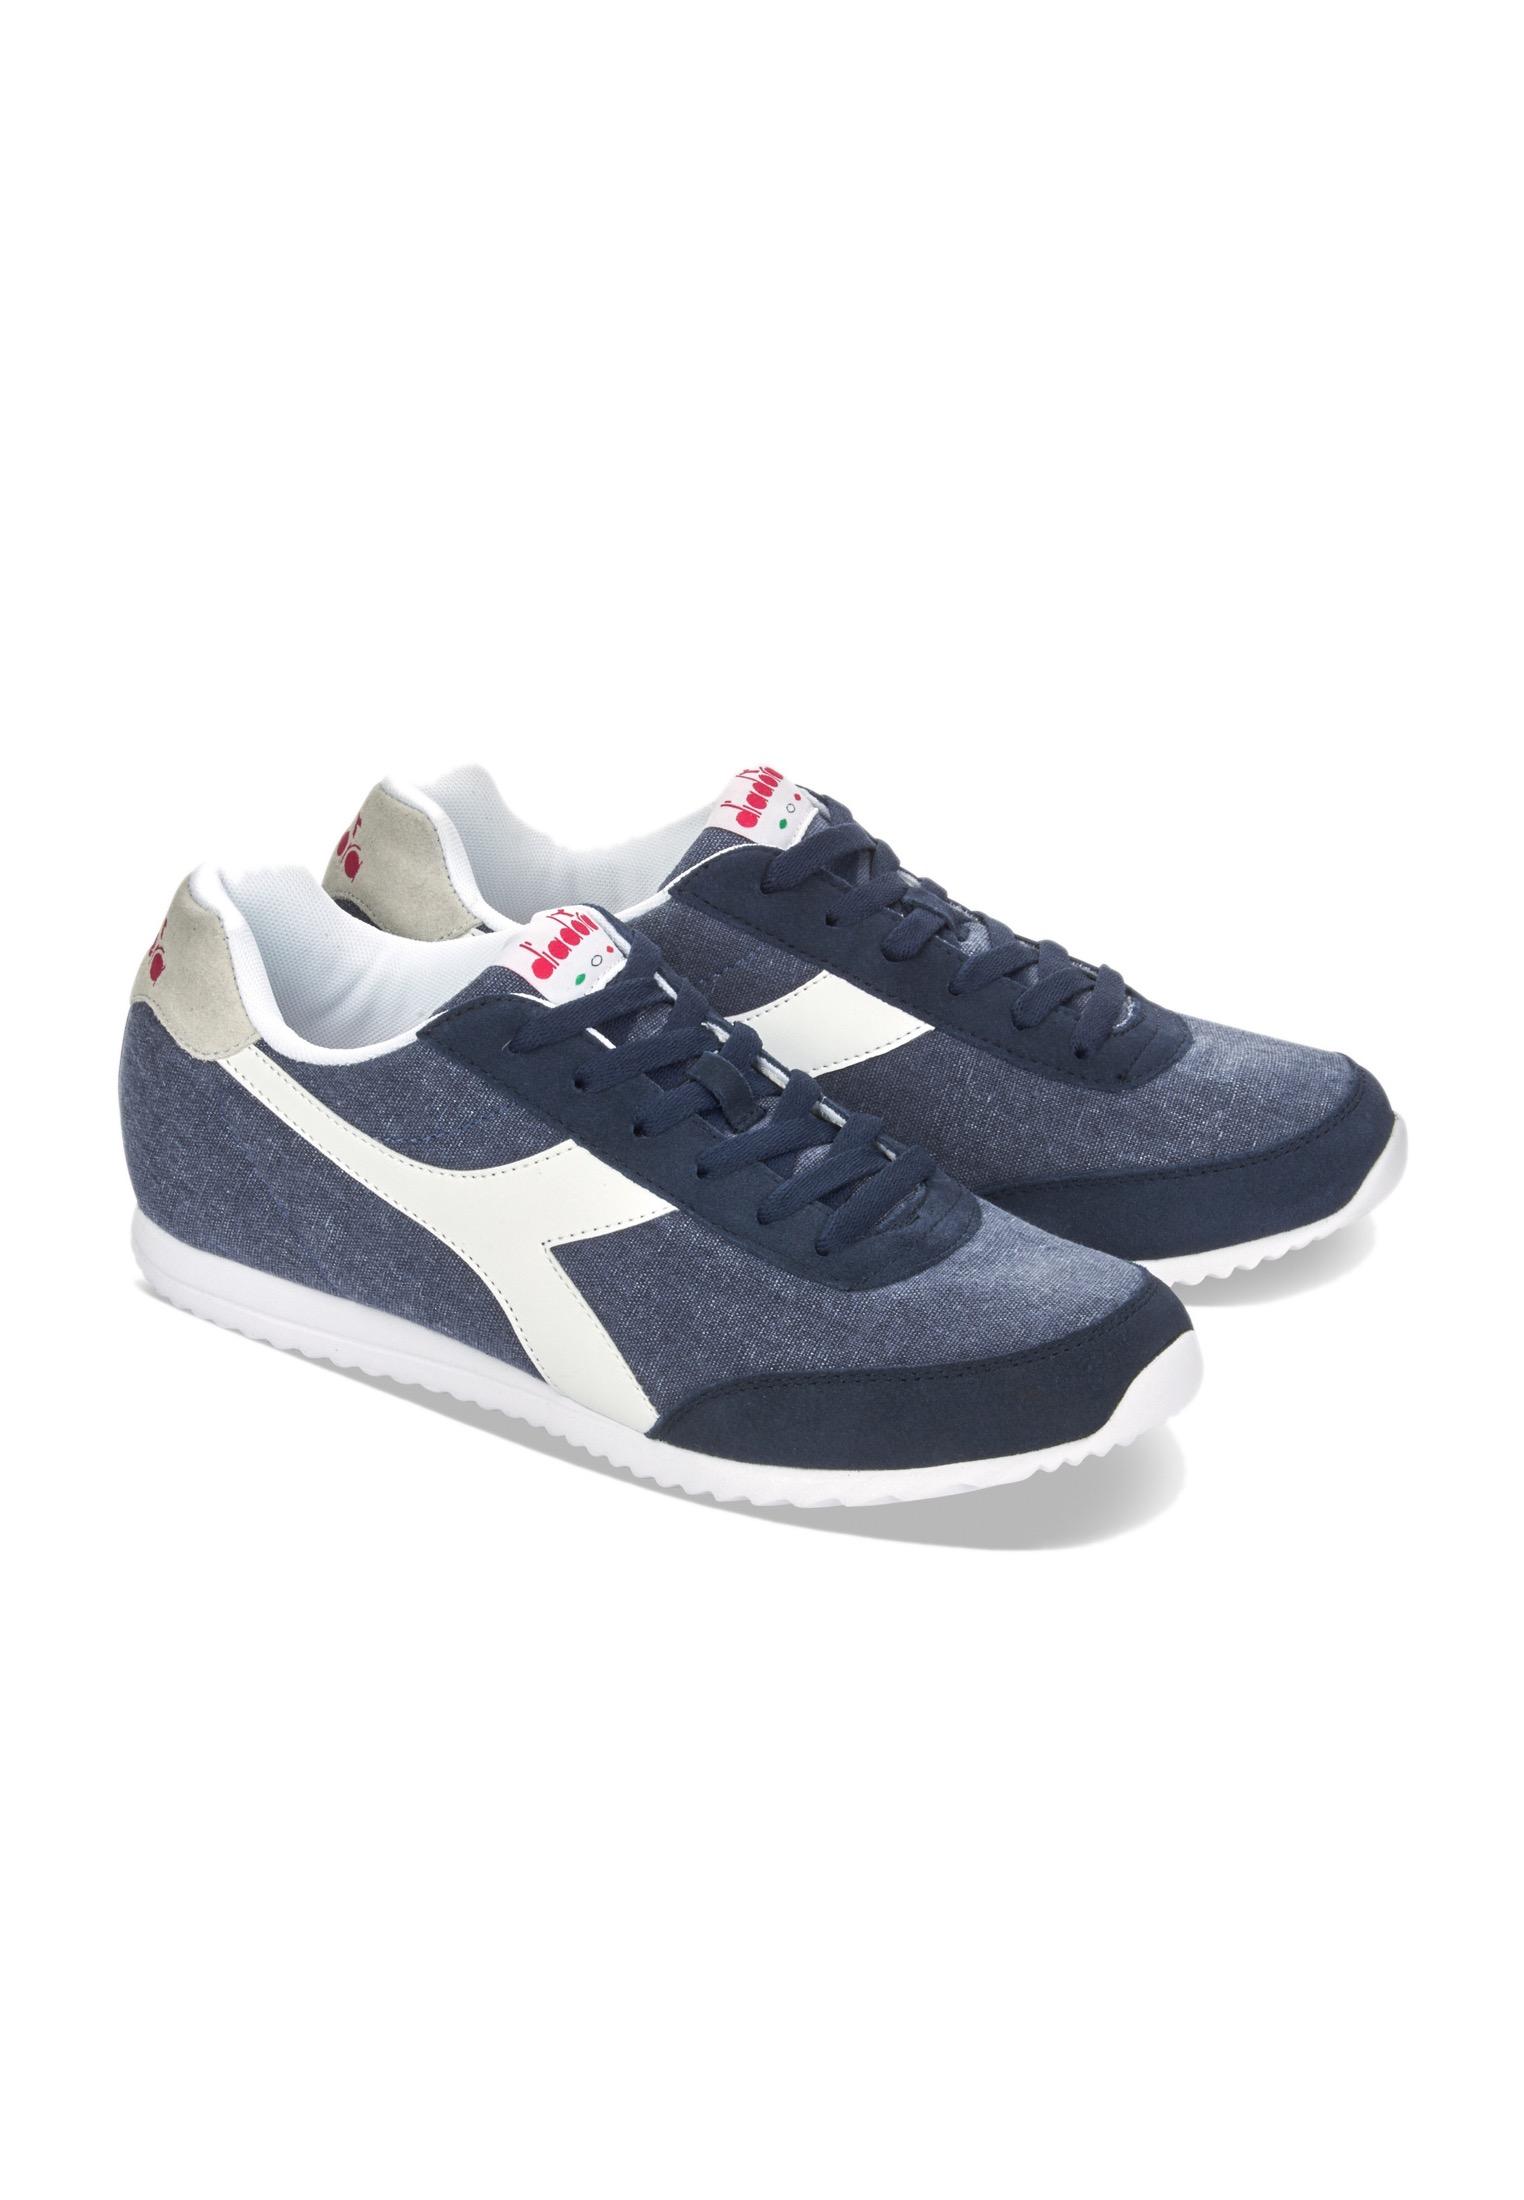 Scarpe-Diadora-Jog-Light-C-Sneakers-sportive-uomo-donna-vari-colori-e-taglie miniatura 23